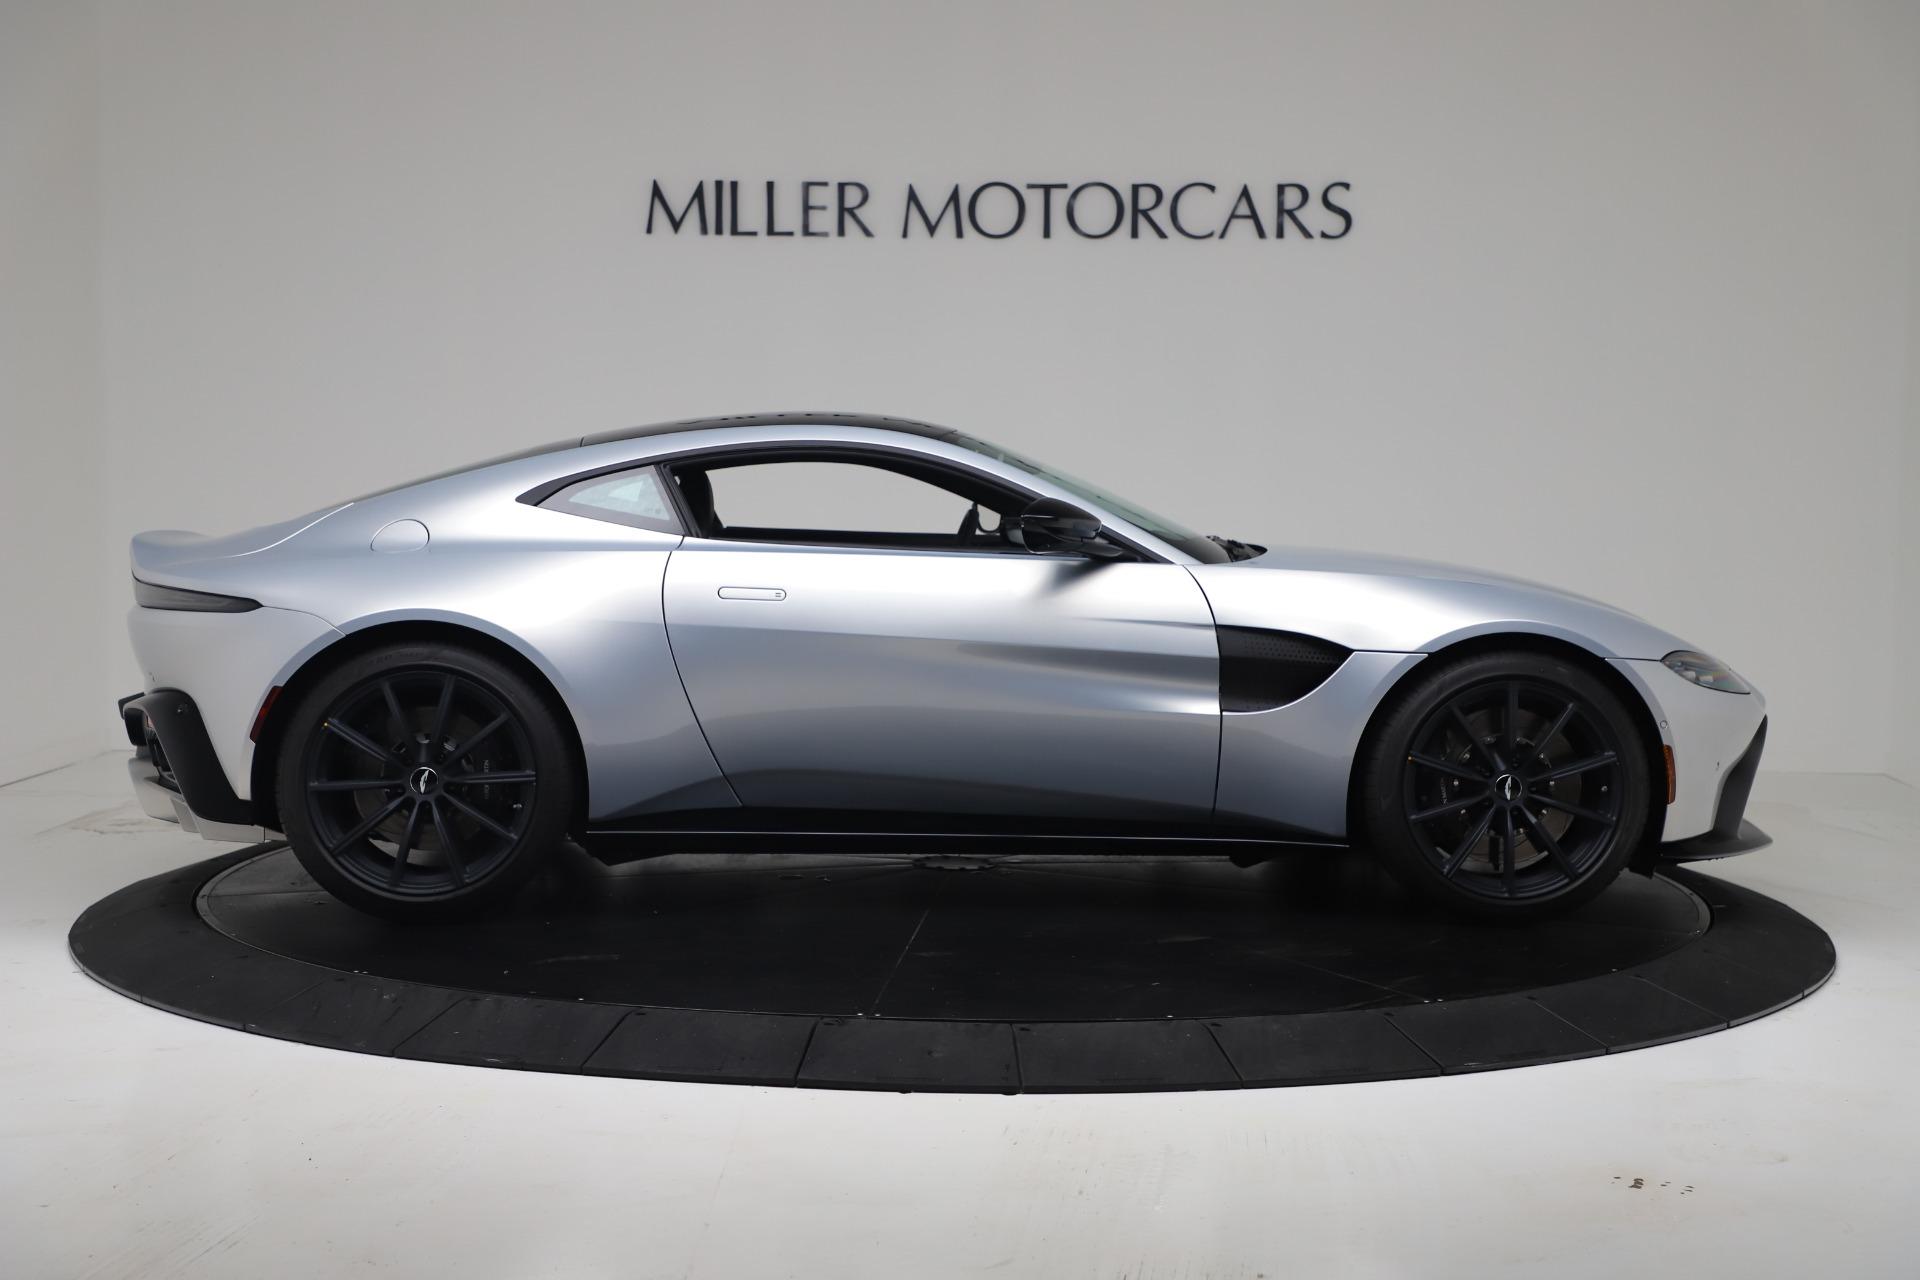 New 2020 Aston Martin Vantage V8 For Sale In Westport, CT 3481_p11